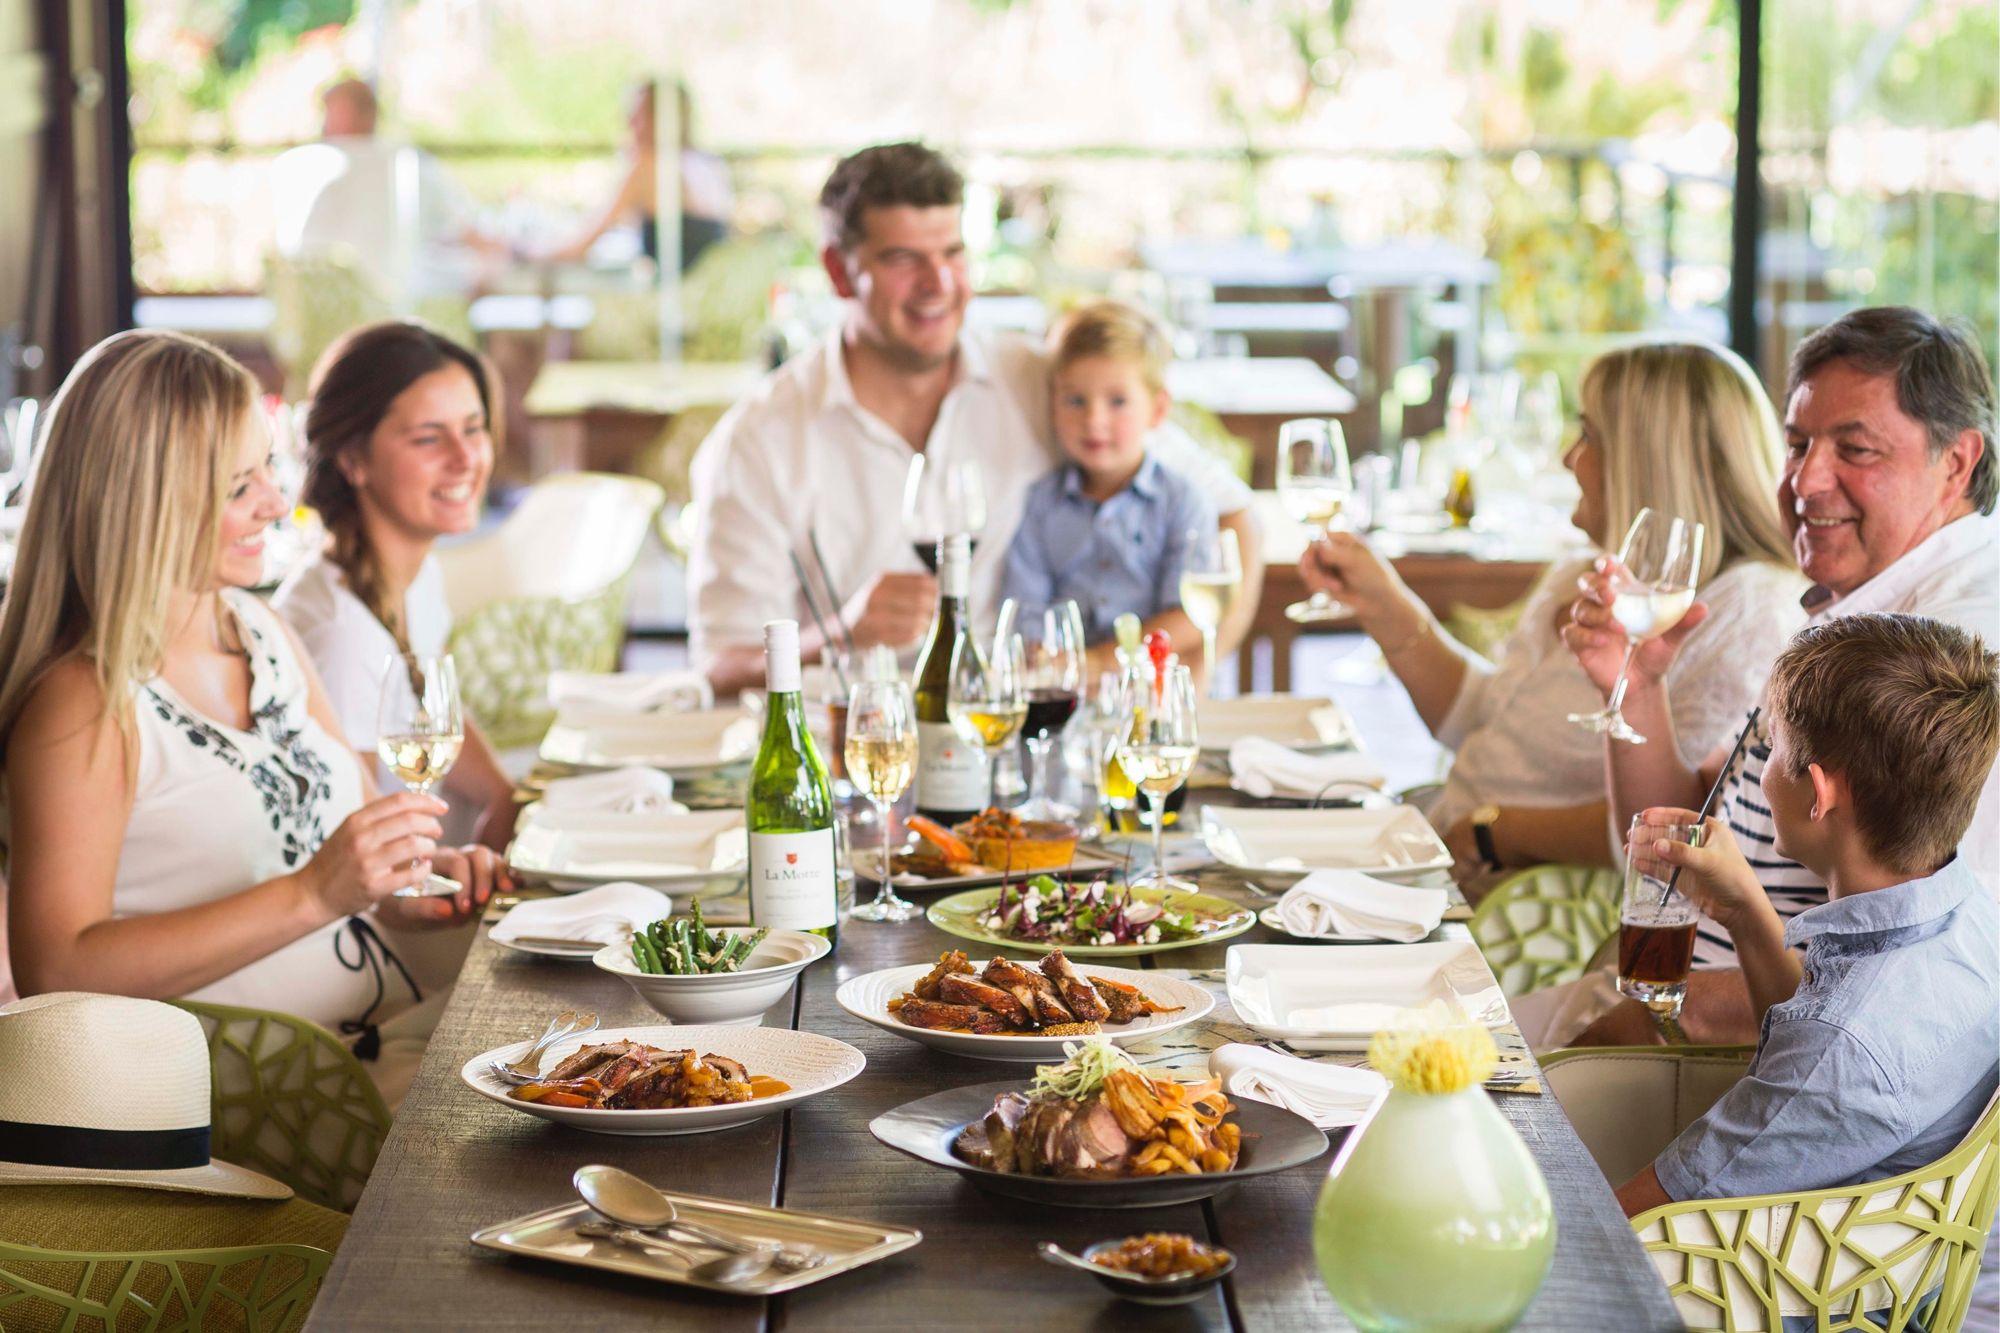 family eating at restaurant - HD1906×1271